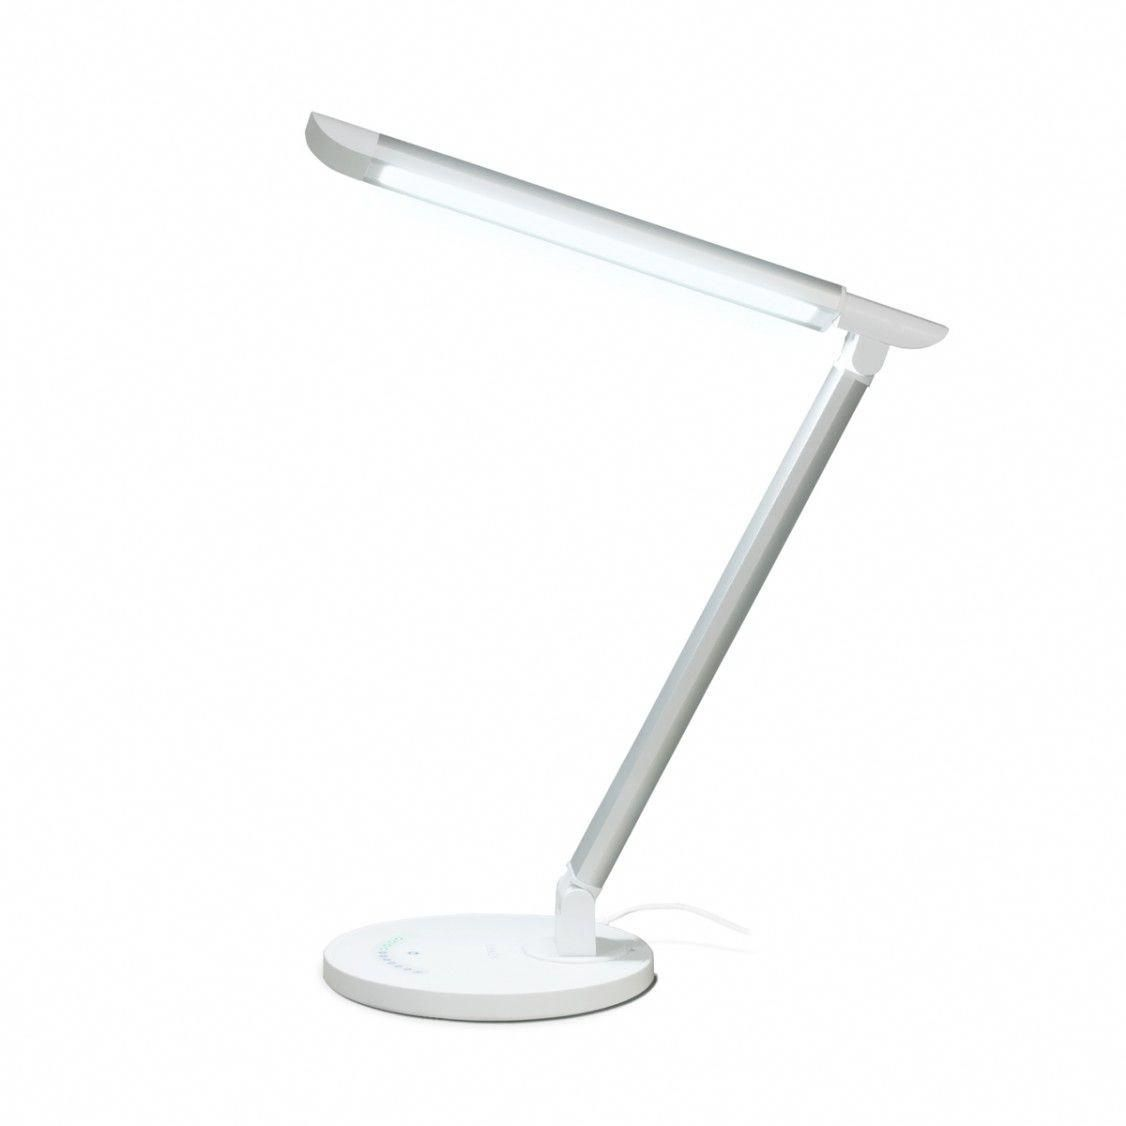 75 Lumen Led Desk Lamp Fully Wirecutter Pick Desklamps With